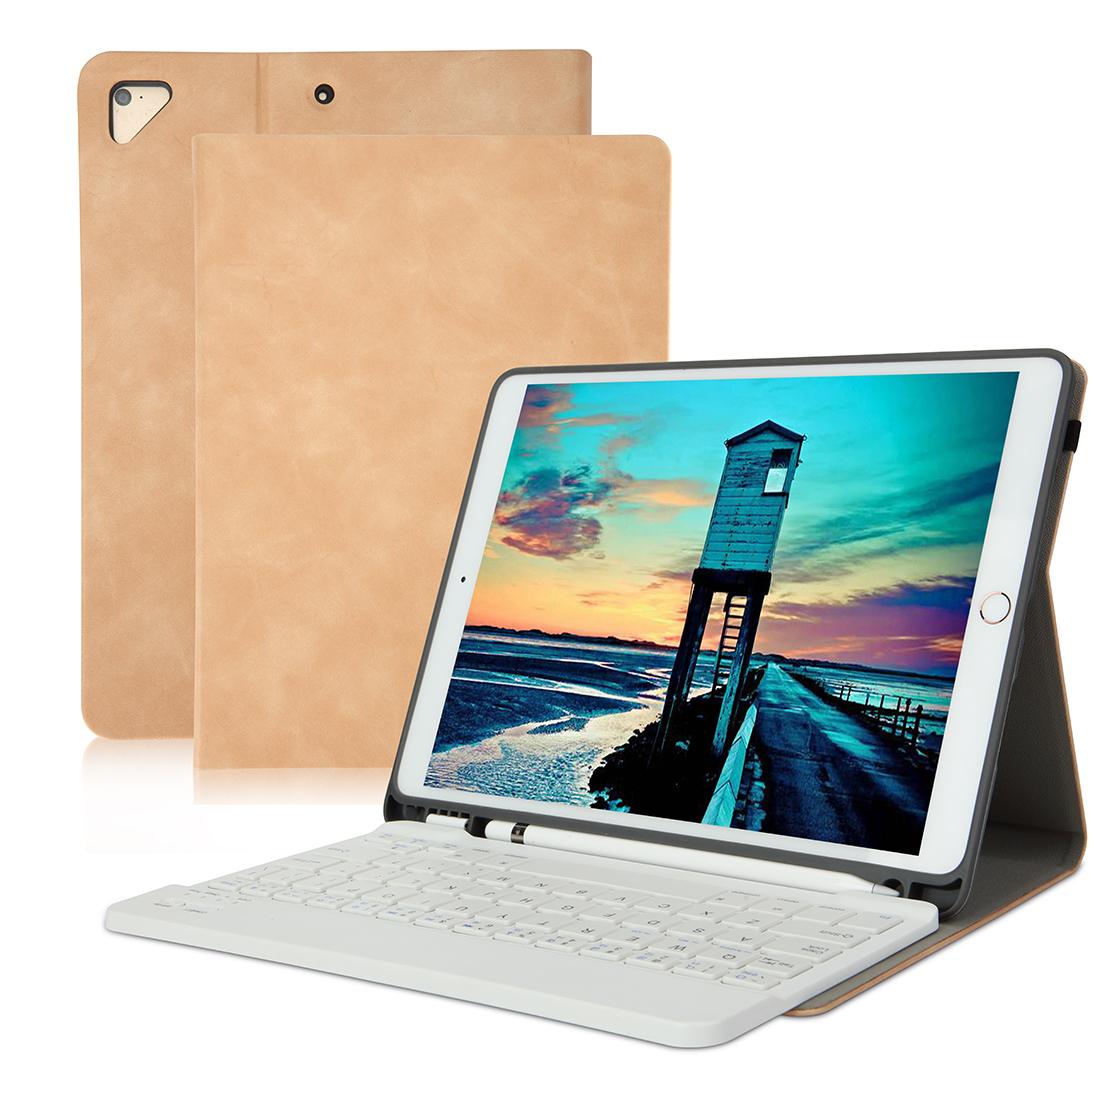 Best iPad Keyboard Case 6th Generation Also Fits iPad 5th ...